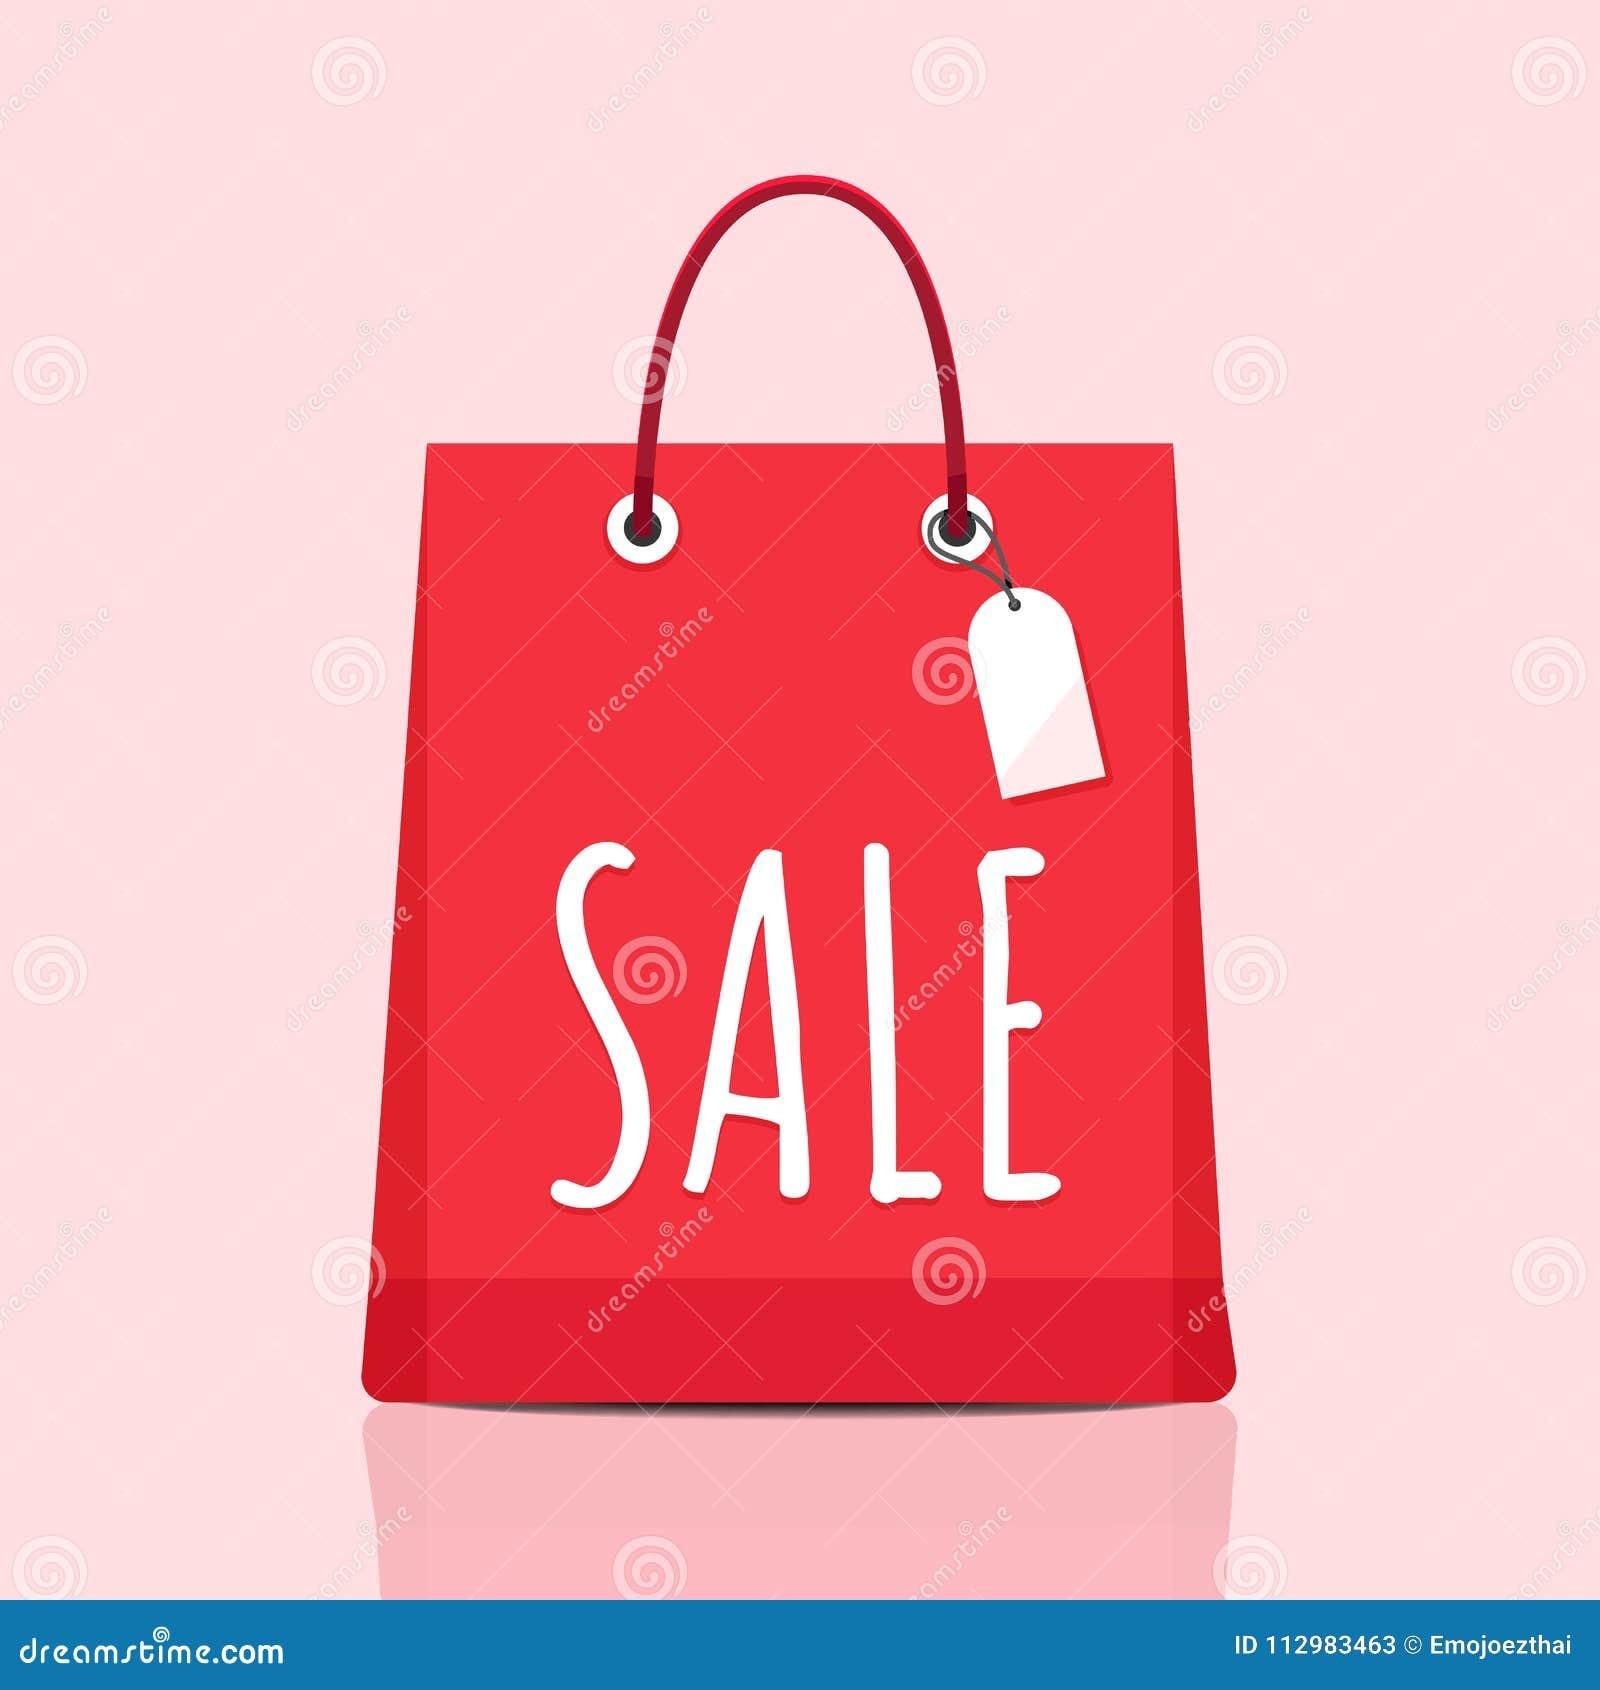 Shopping bag and item fashion gadget clothier. Illustrator vector set.